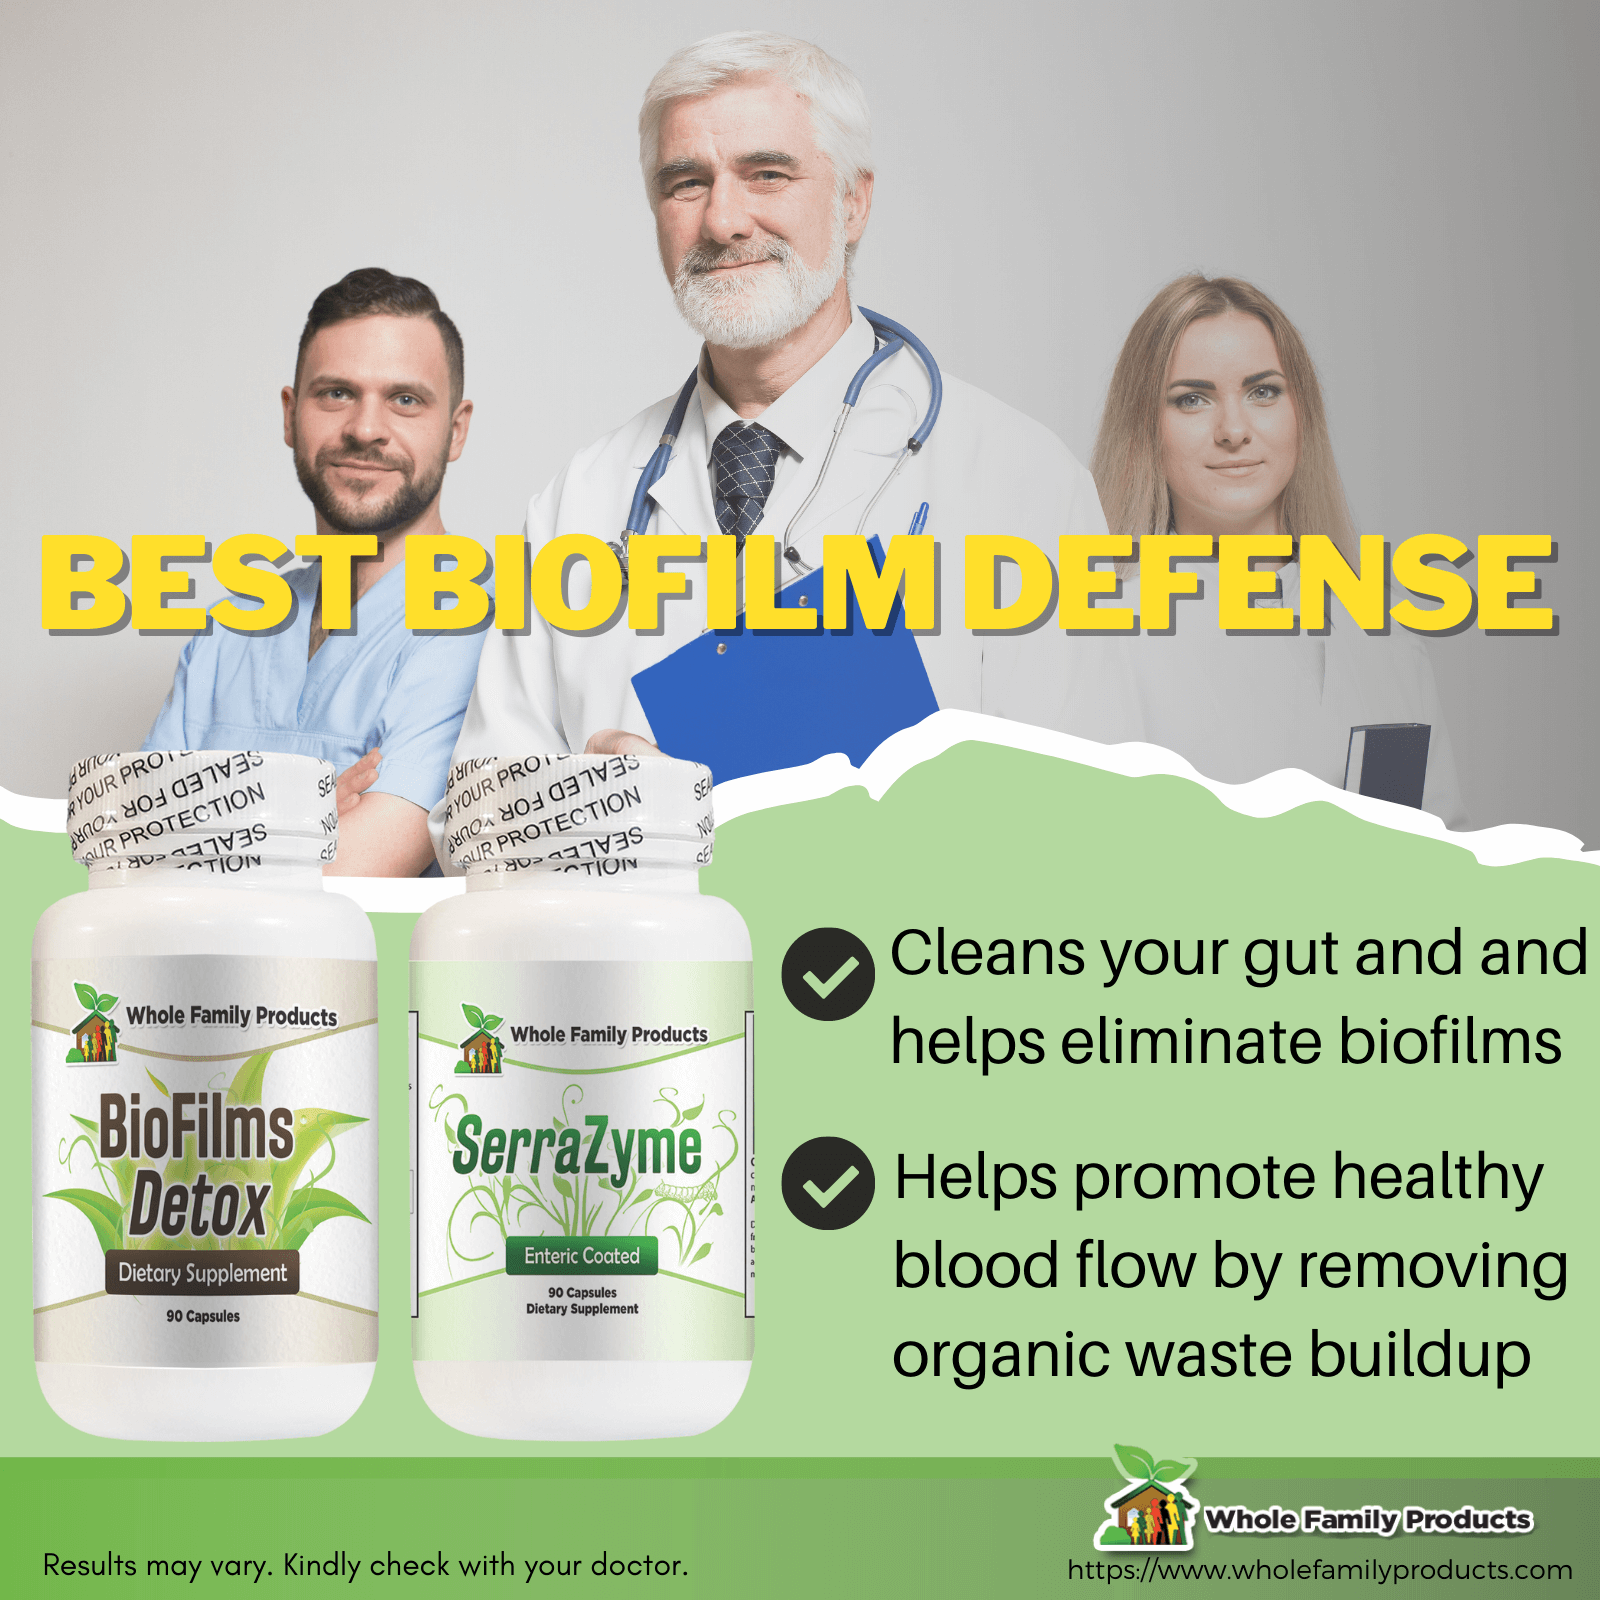 Best Biofilm Defense Infographic Biofilm Detox and Serrazyme Enzyme